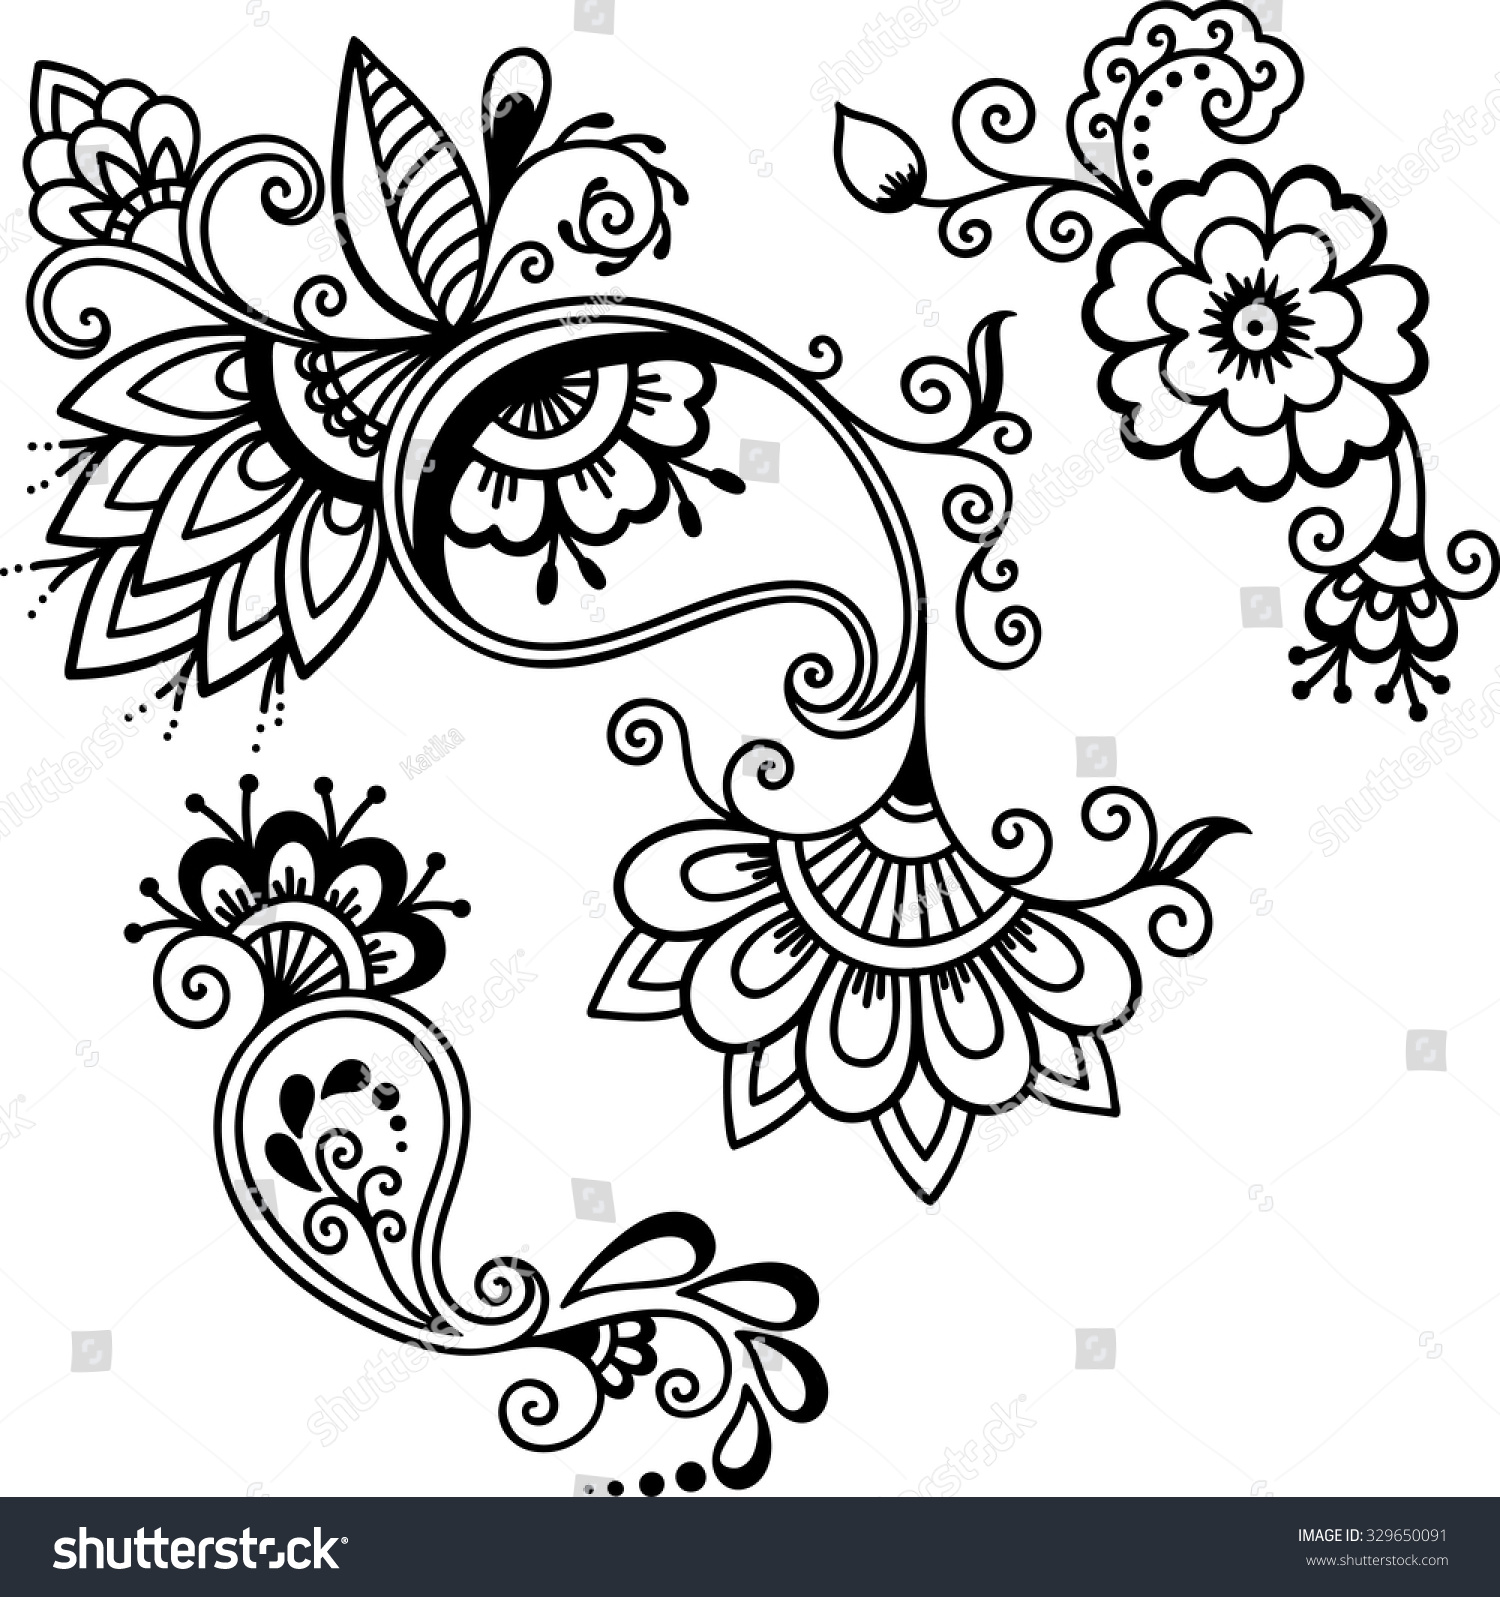 Henna Tattoo Vector: Henna Tattoo Flower Template Stock Vector 329650091